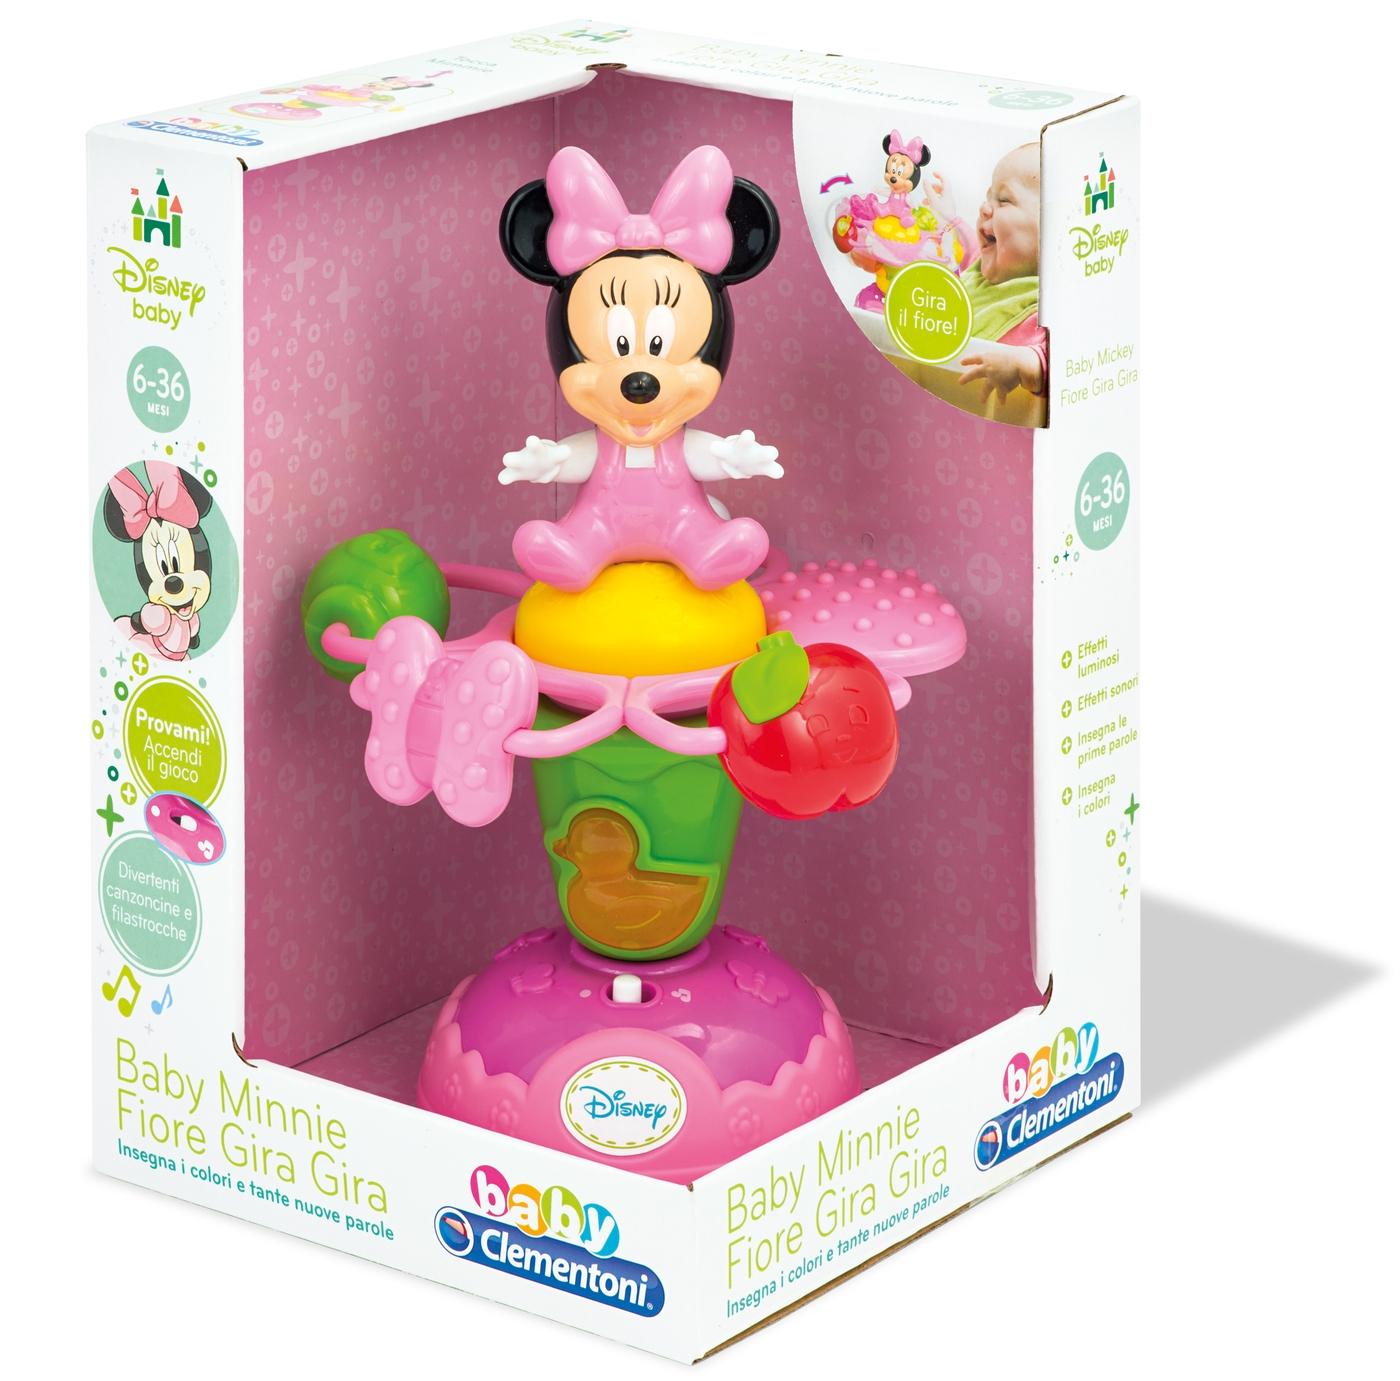 Музыкальная игрушка Baby Сlementoni Minnie Арт.: 14925 (музыка, свет)